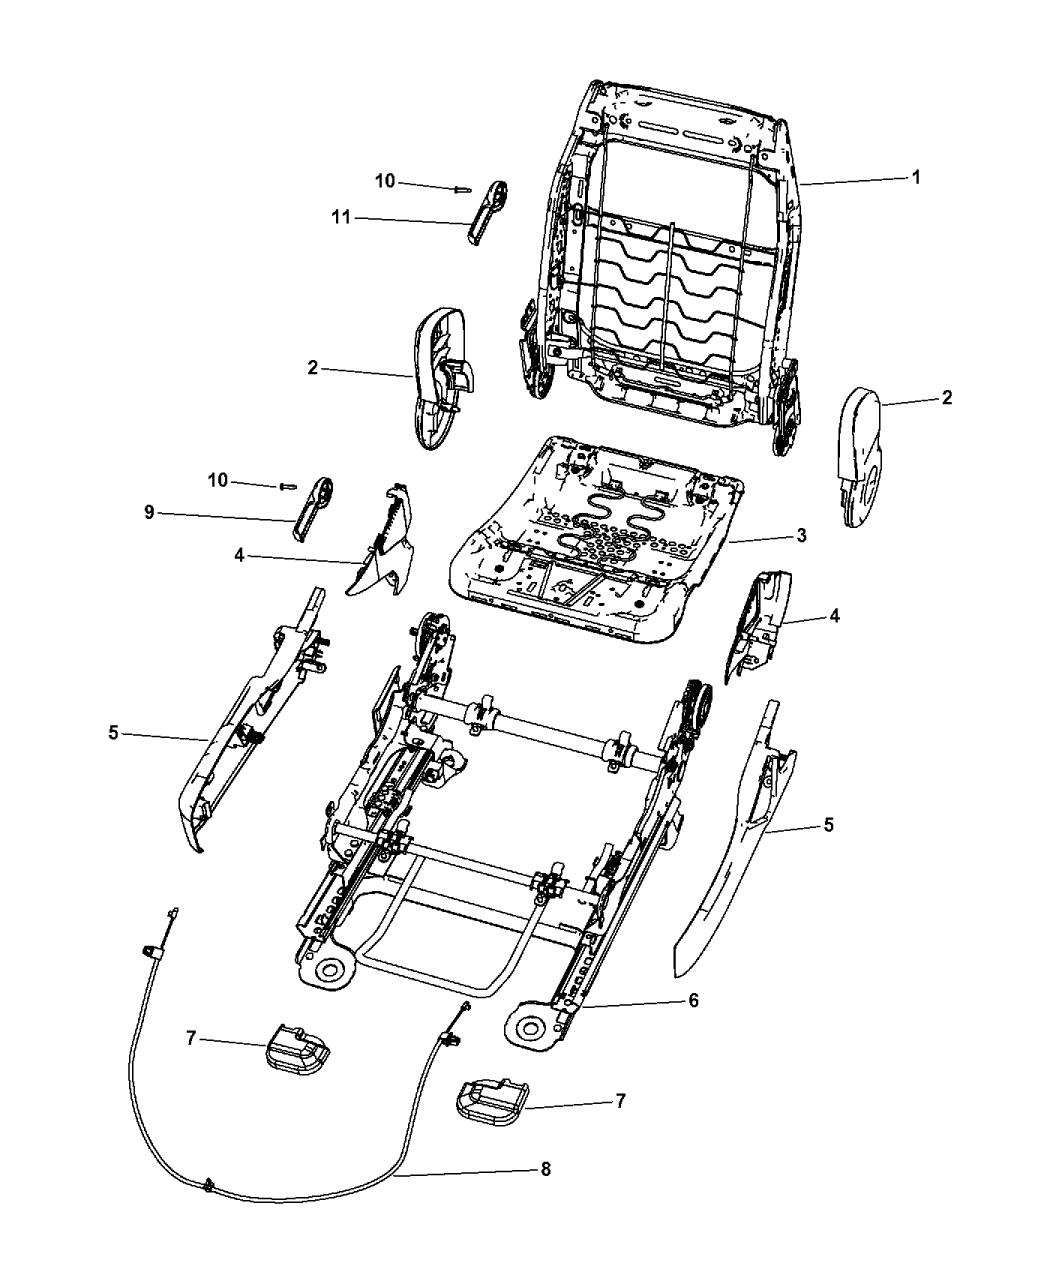 Dodge Avenger Parts Diagram Wiring Diagram Jagged Corsa Jagged Corsa Pasticceriagele It